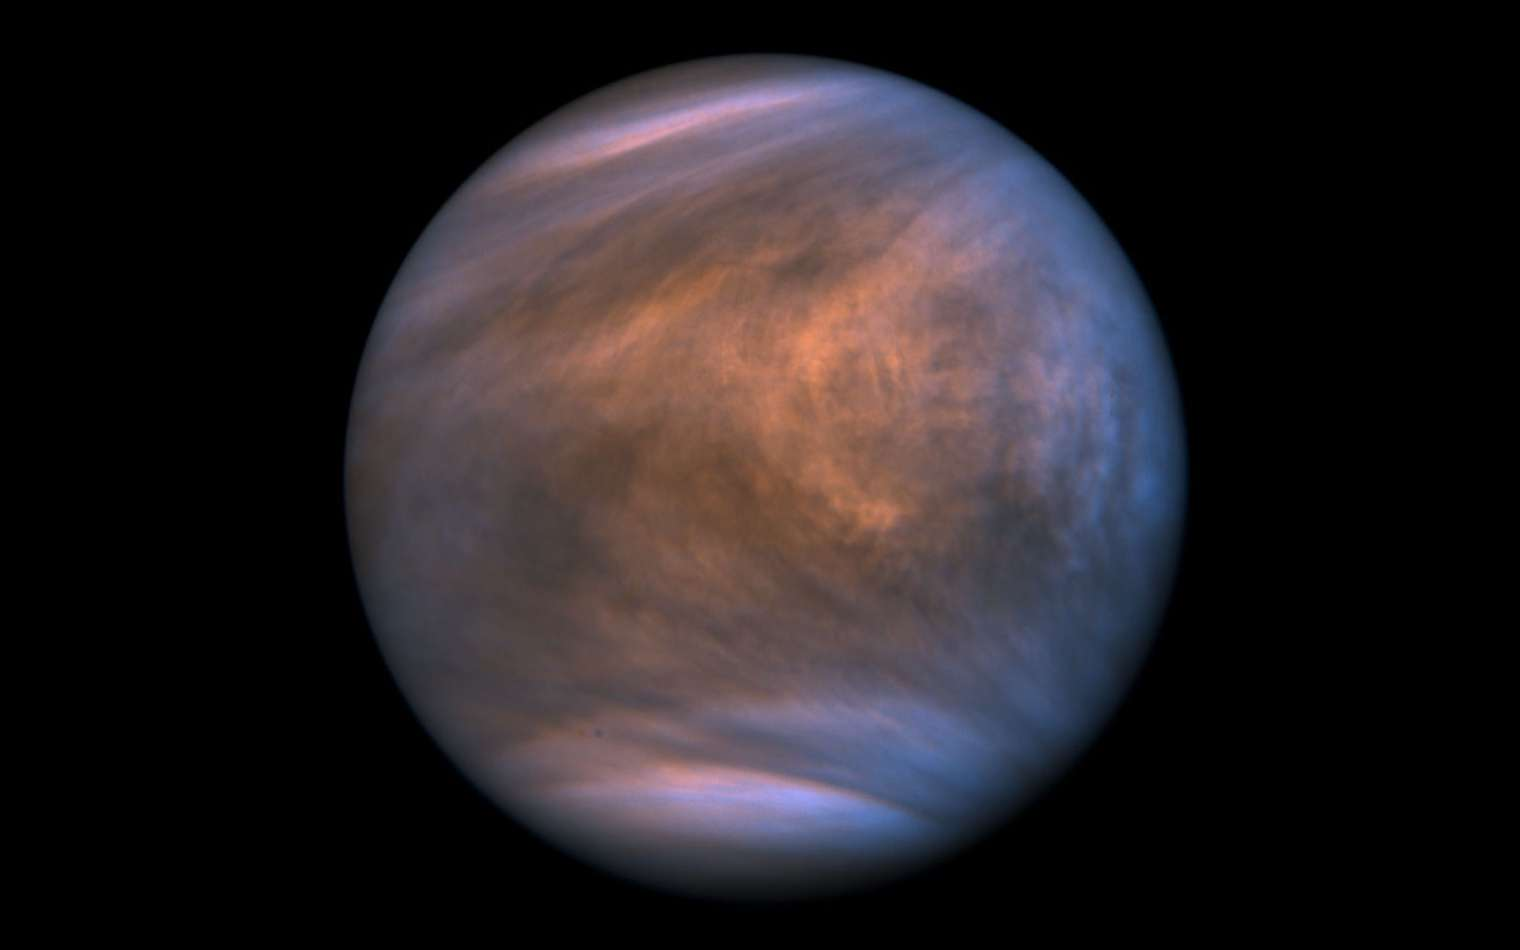 Notre voisine Vénus vue par la sonde japonaise Akatsuki. © Isas, Jaxa, Akatsuki, Meli thev